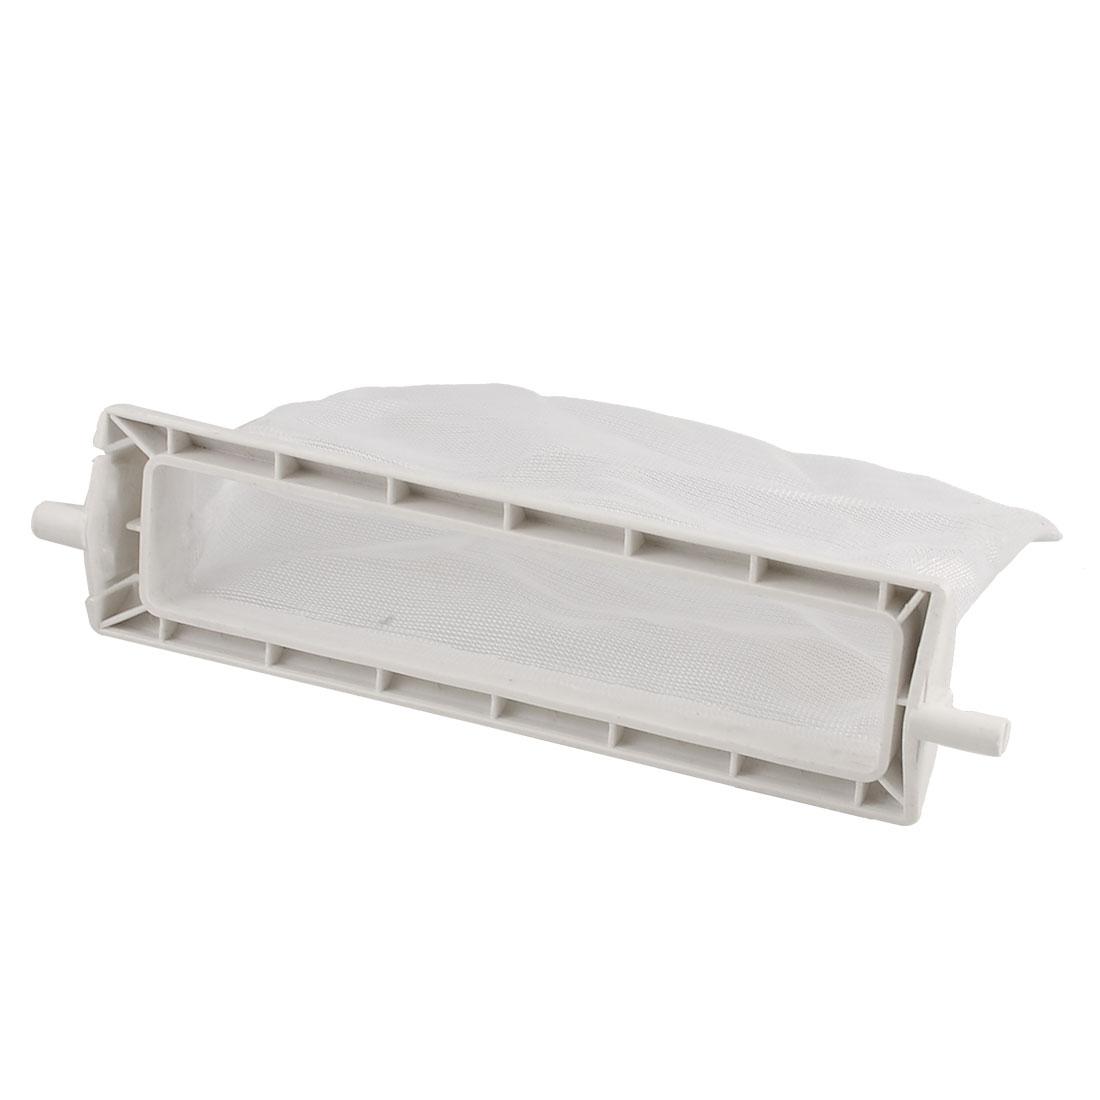 "Washing Machine White Plastic Nylon Filter 5.5"" x 2.8"" Meshy Bag"